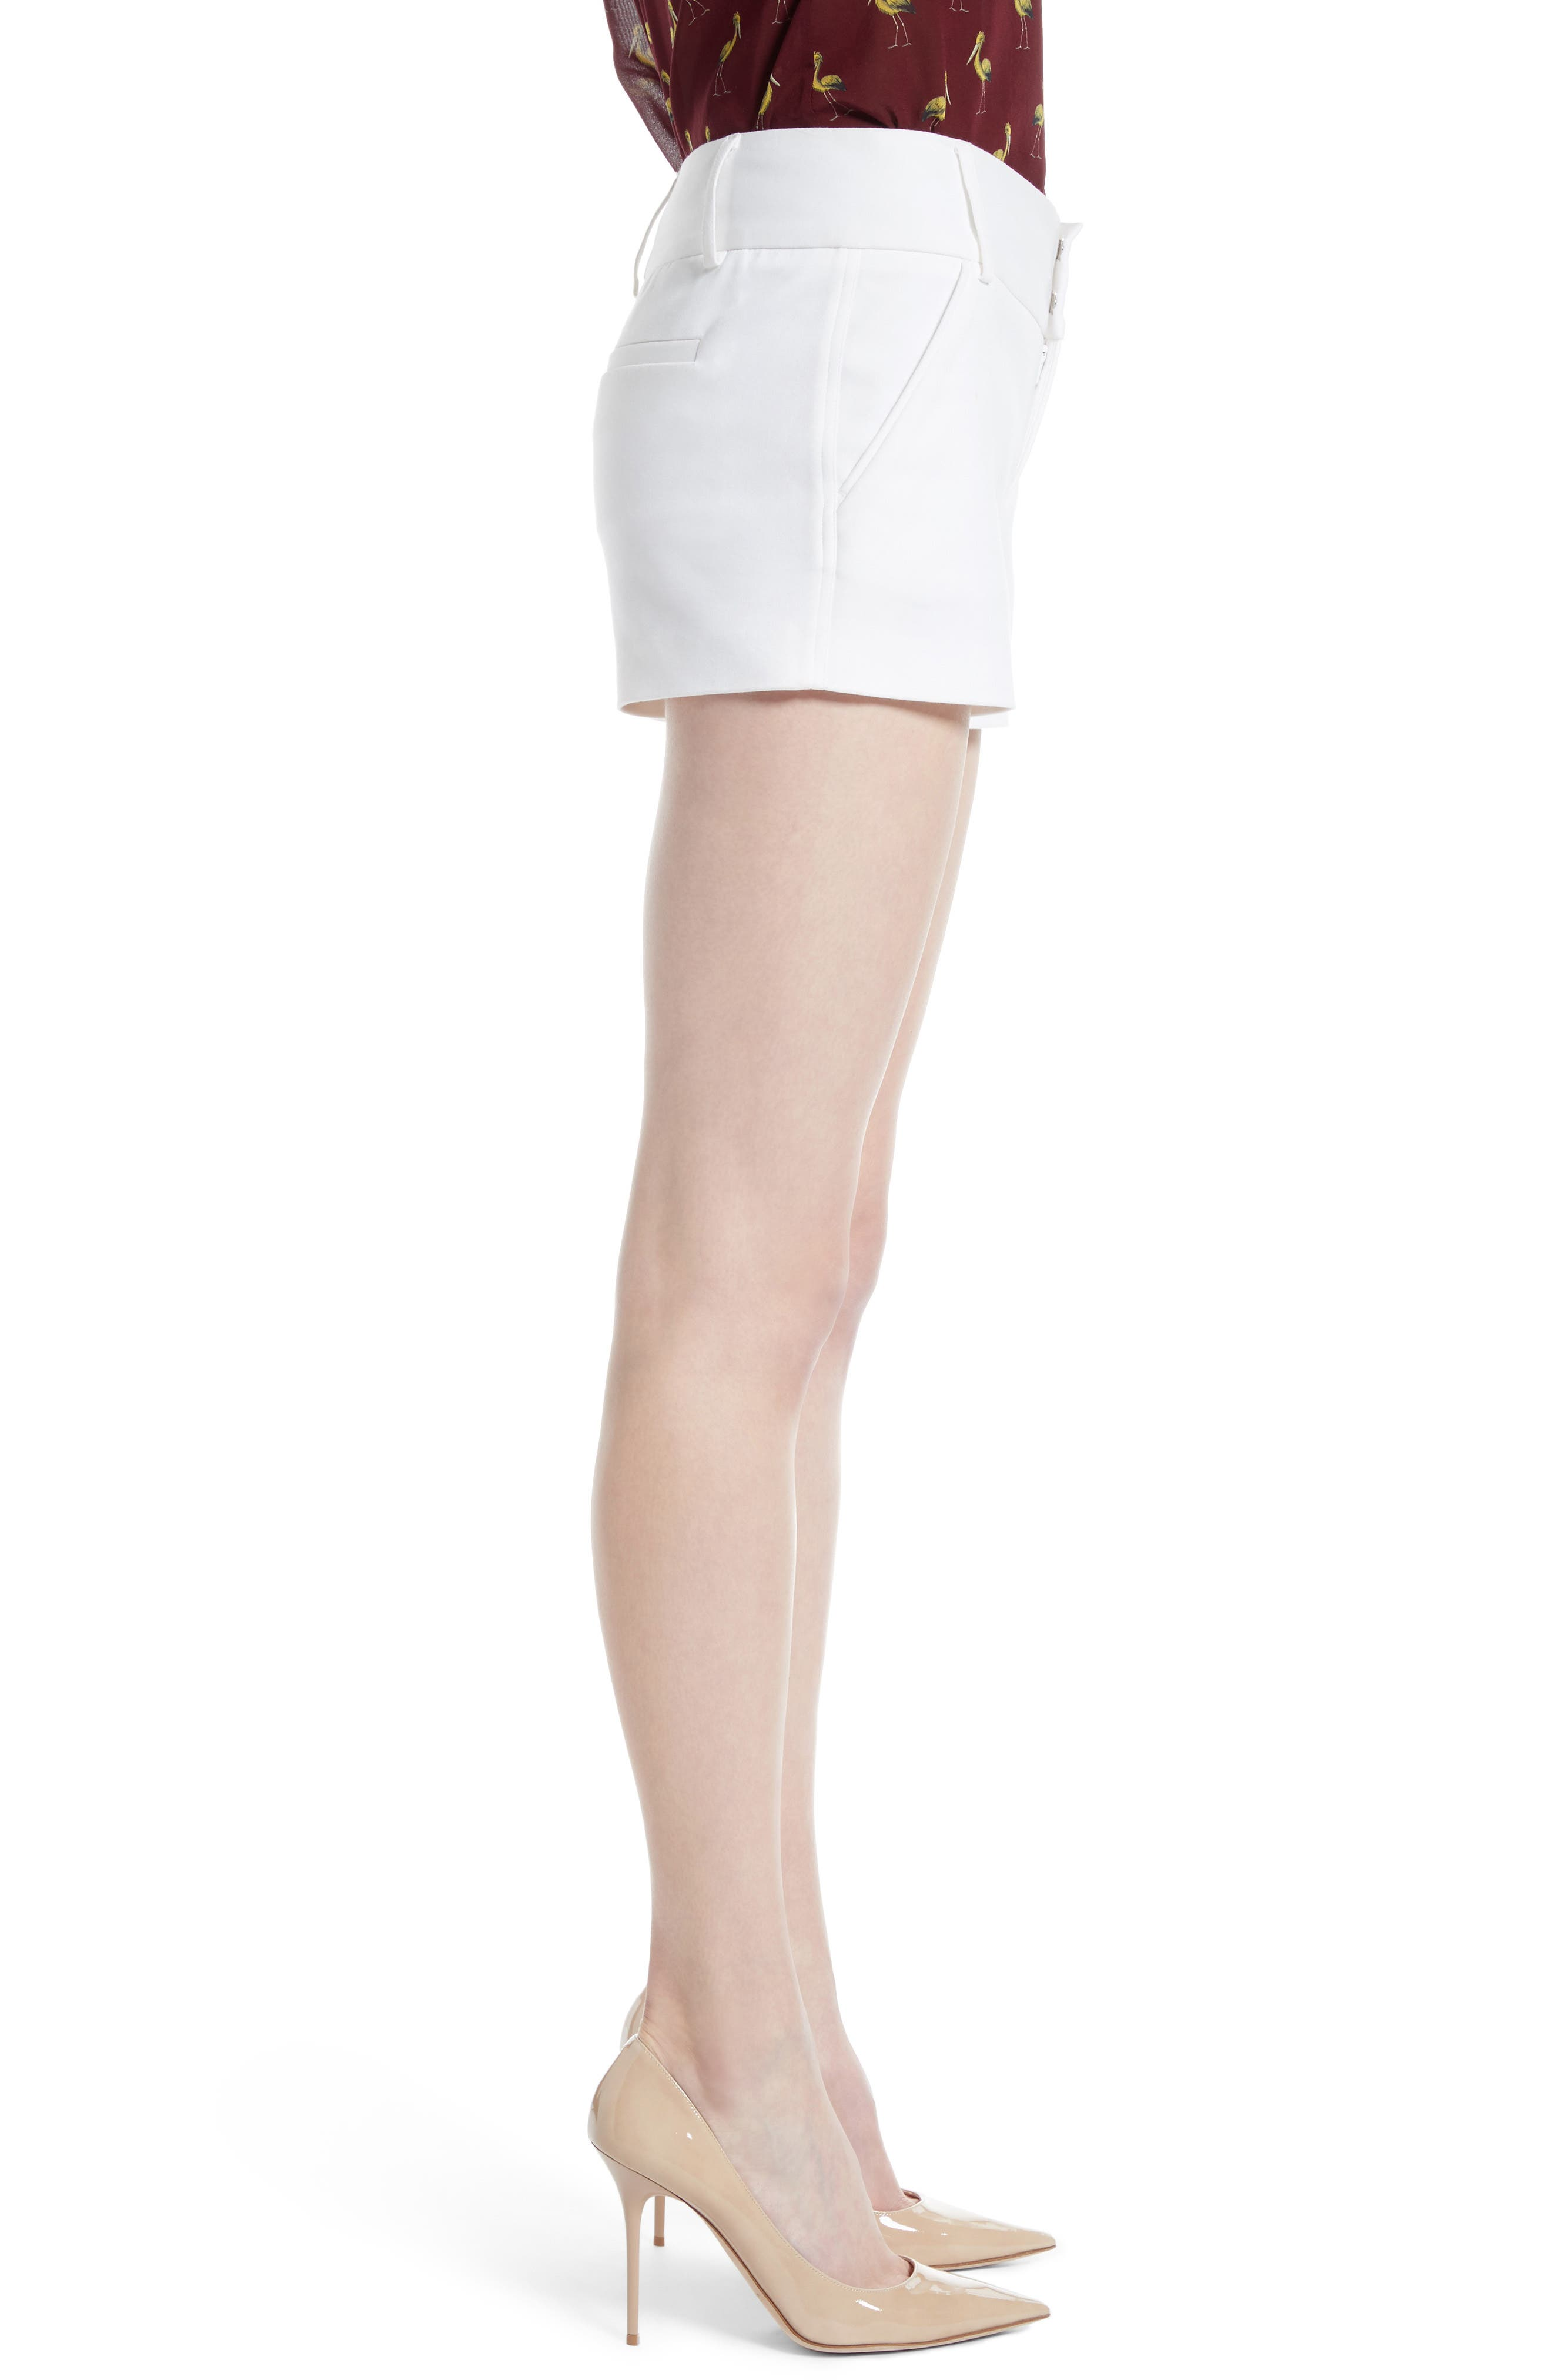 Cady Cotton Blend Shorts,                             Alternate thumbnail 3, color,                             White